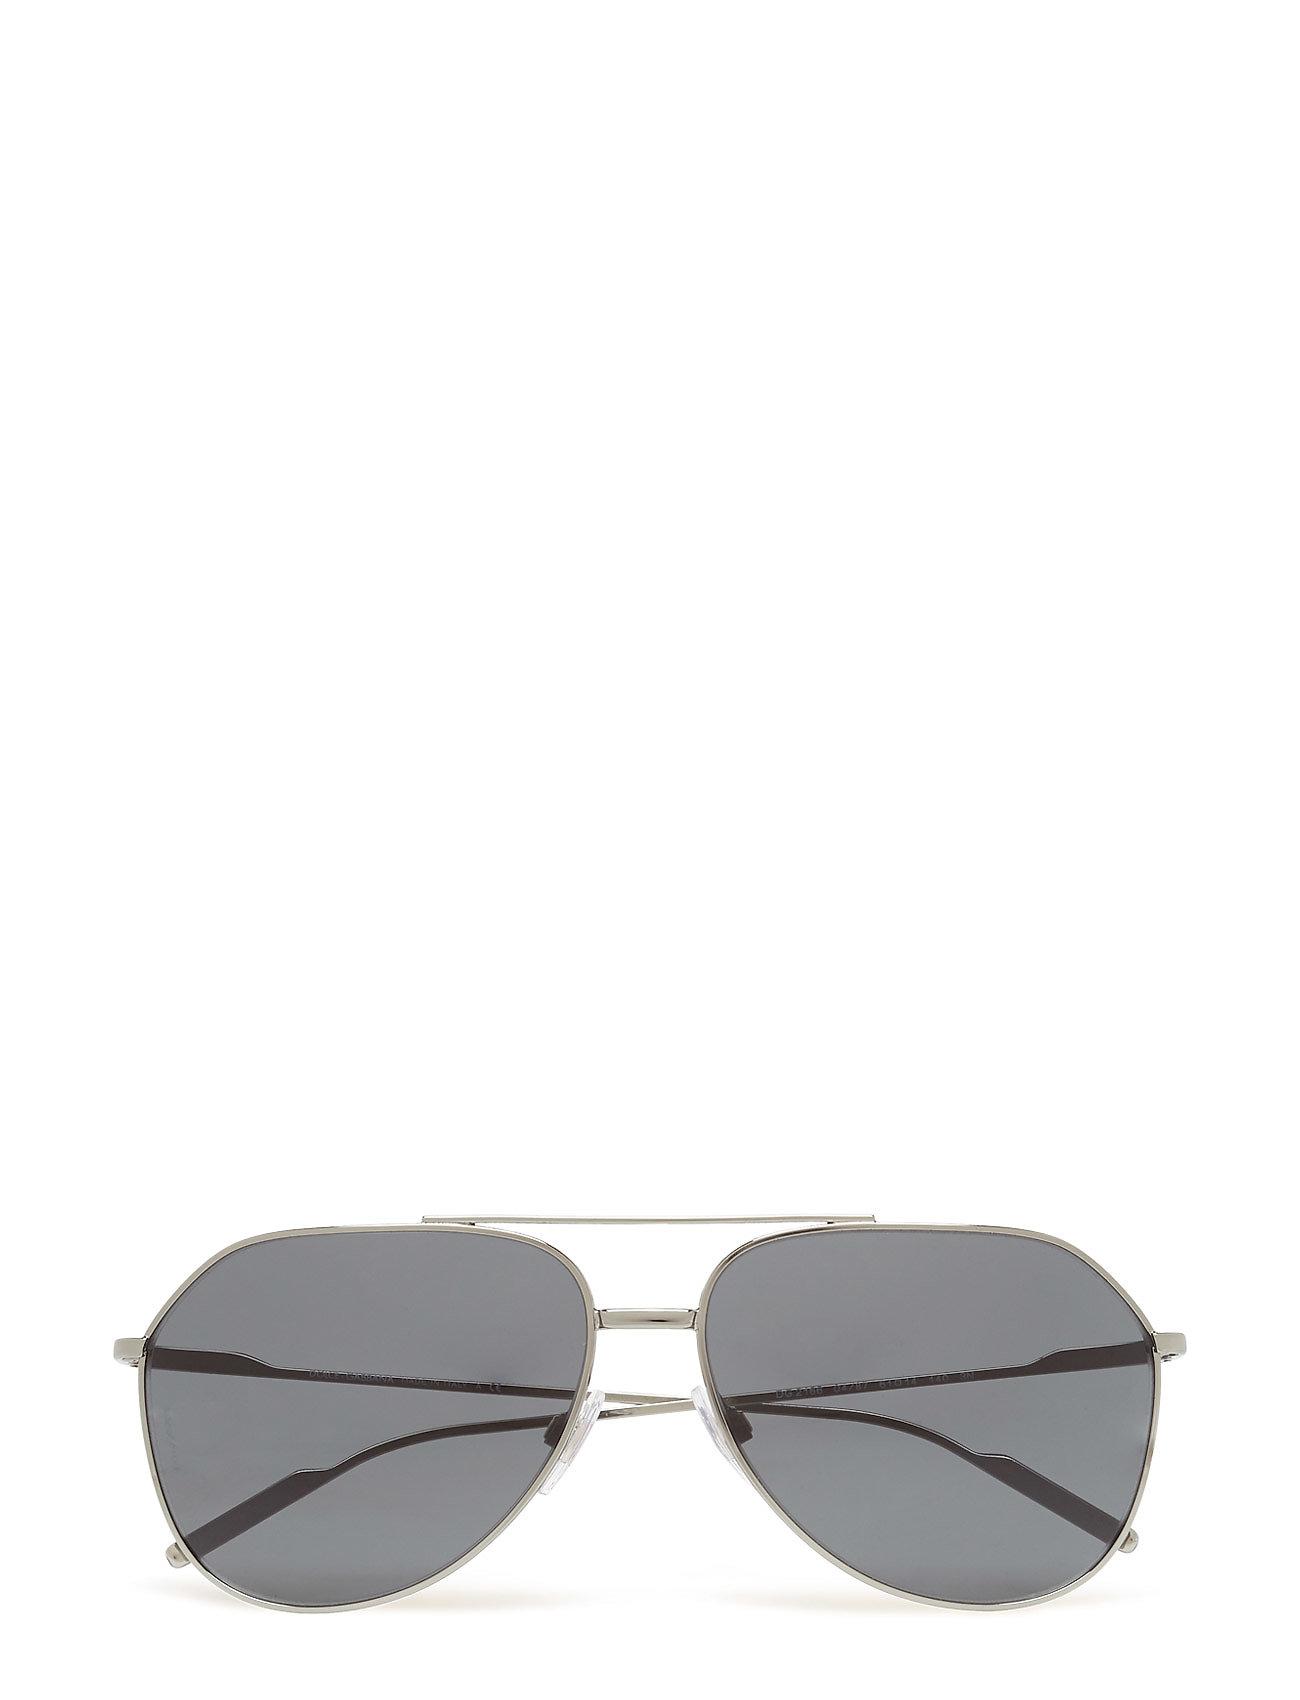 Aviator Dolce & Gabbana Sunglasses Accessories til Mænd i